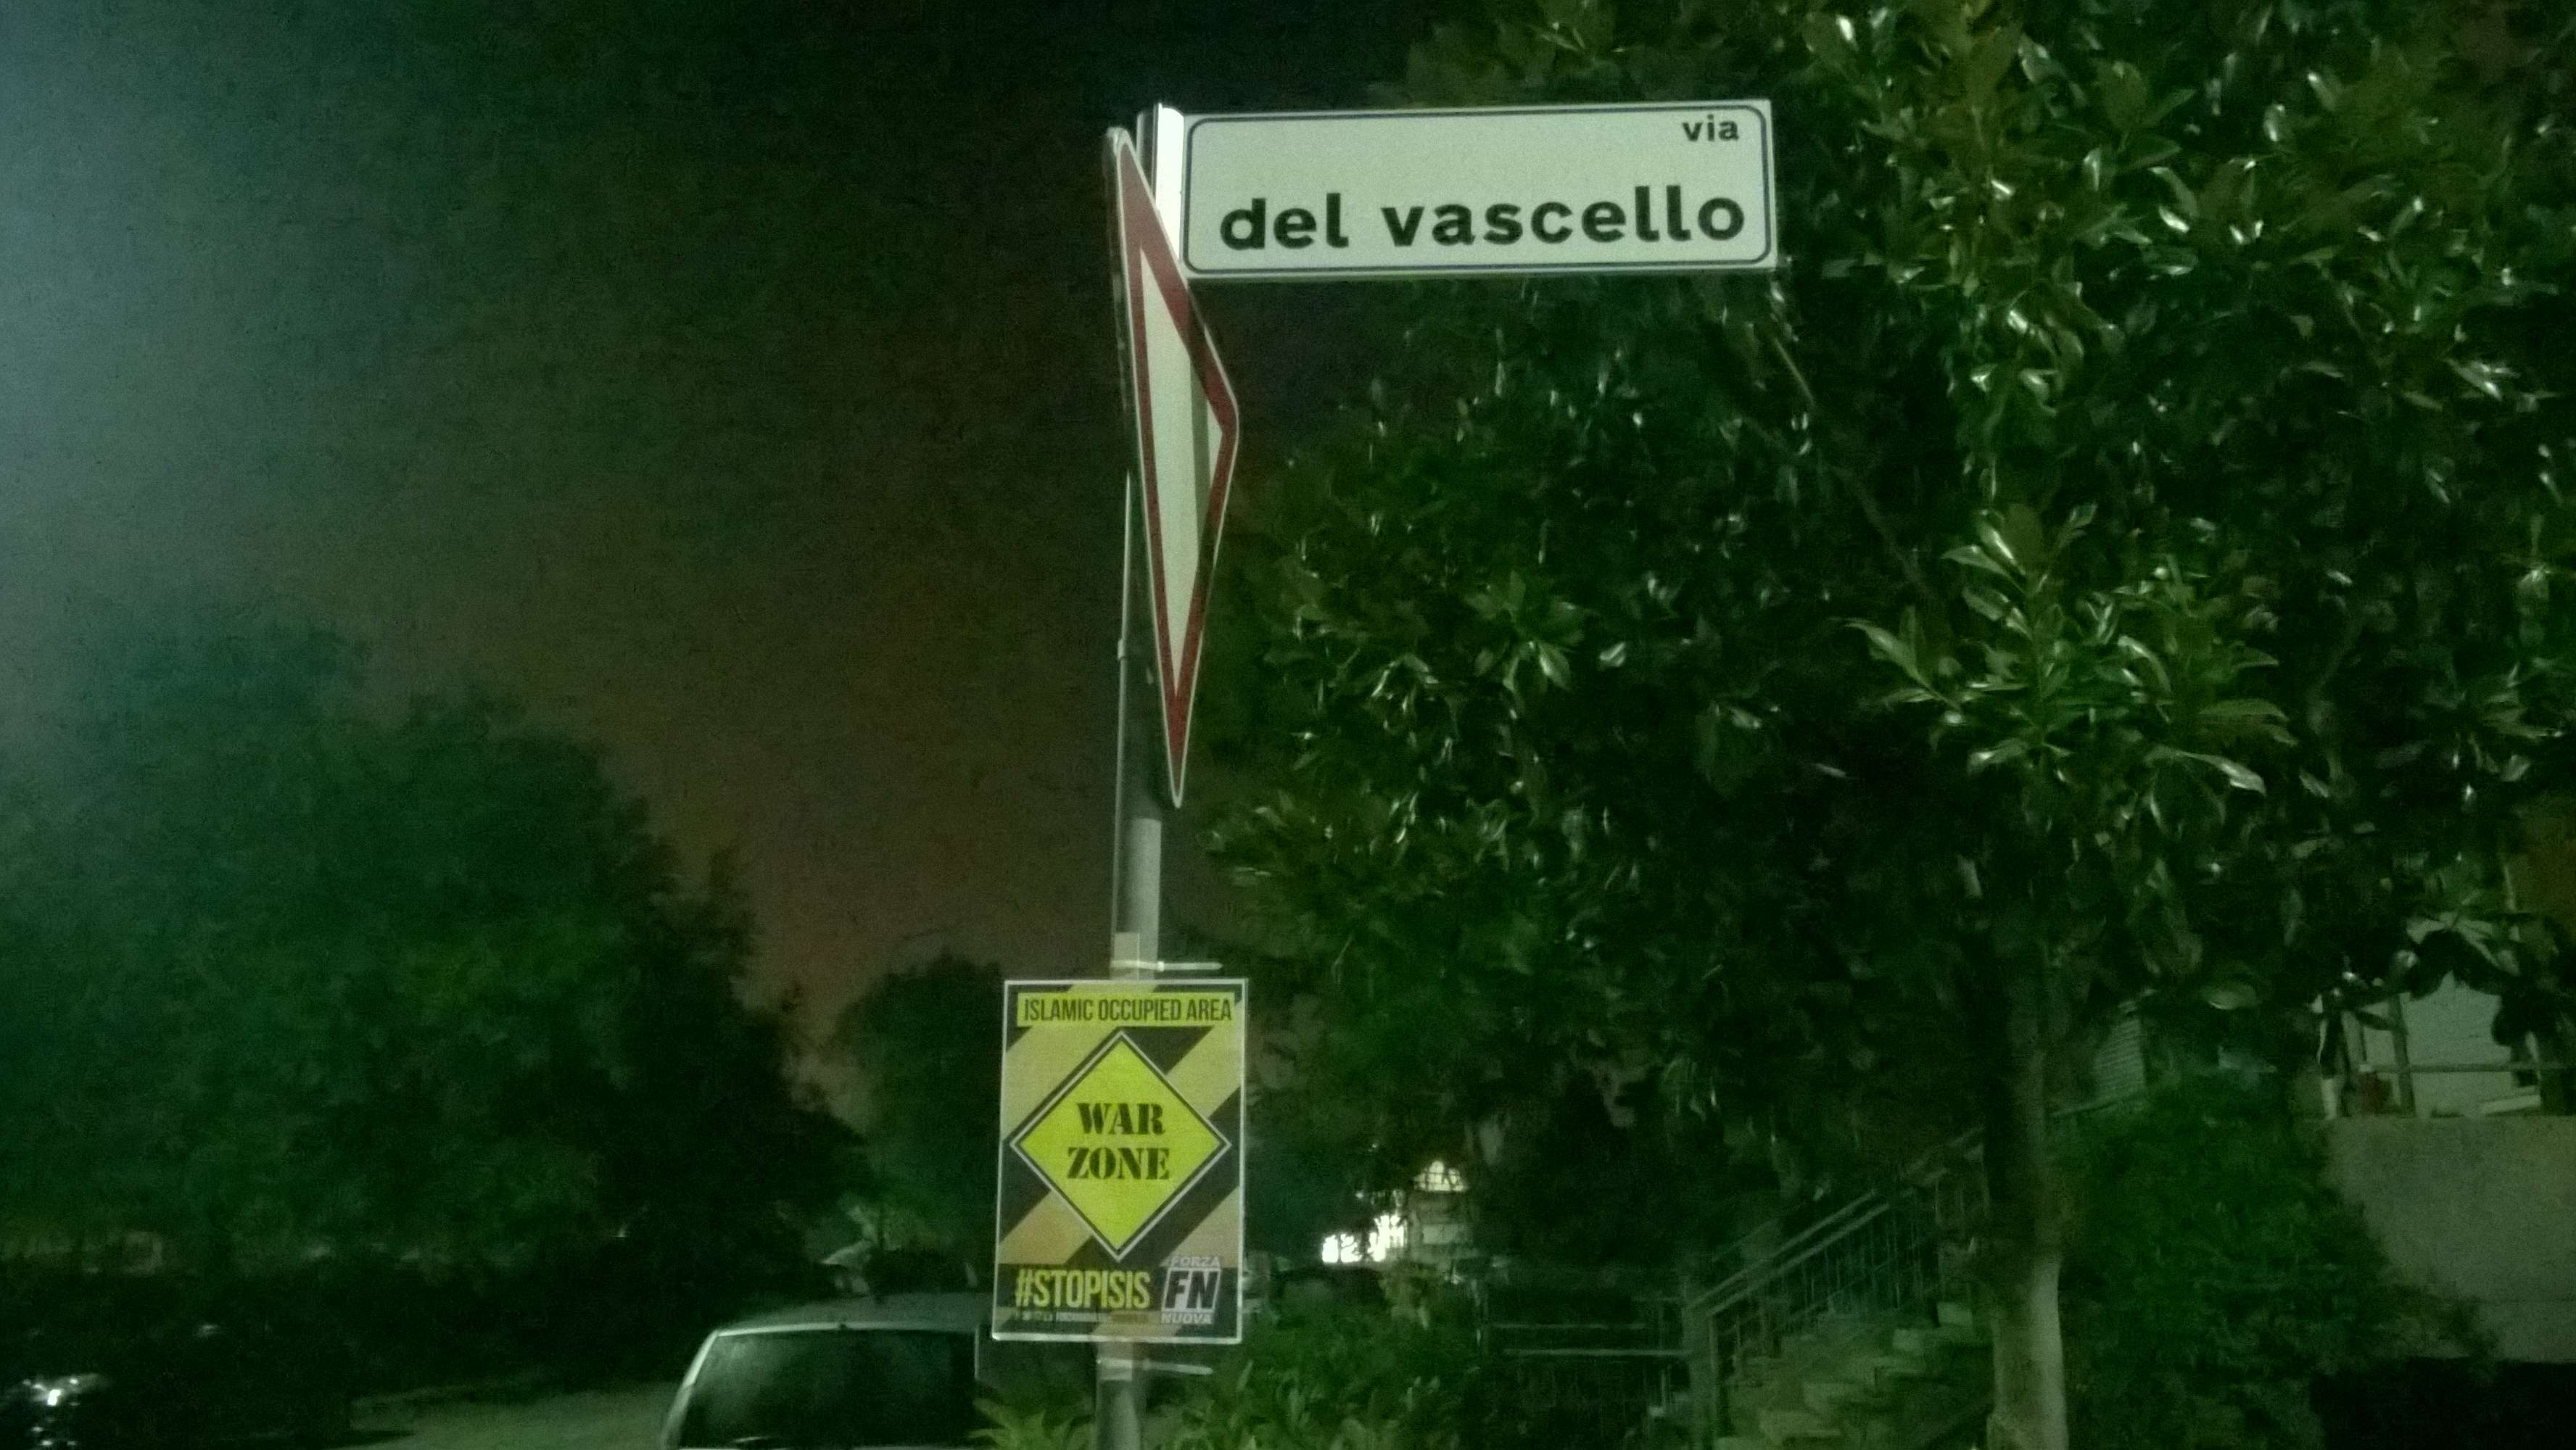 Via del Vascello Pesaro